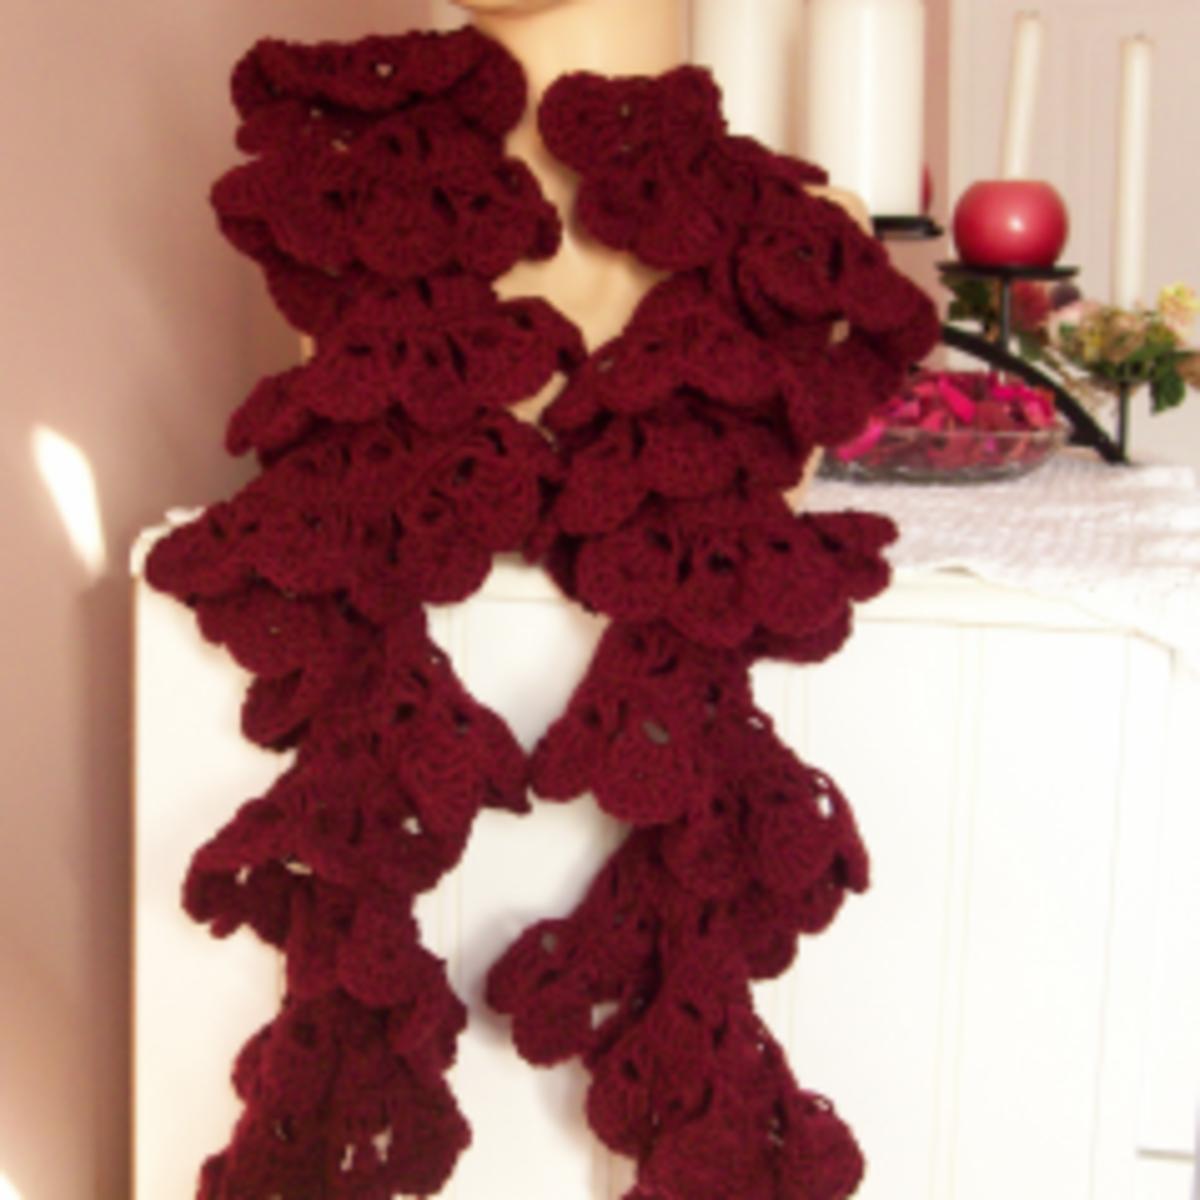 Broomstick Lace Ruffled Scarf - Free Crochet Pattern